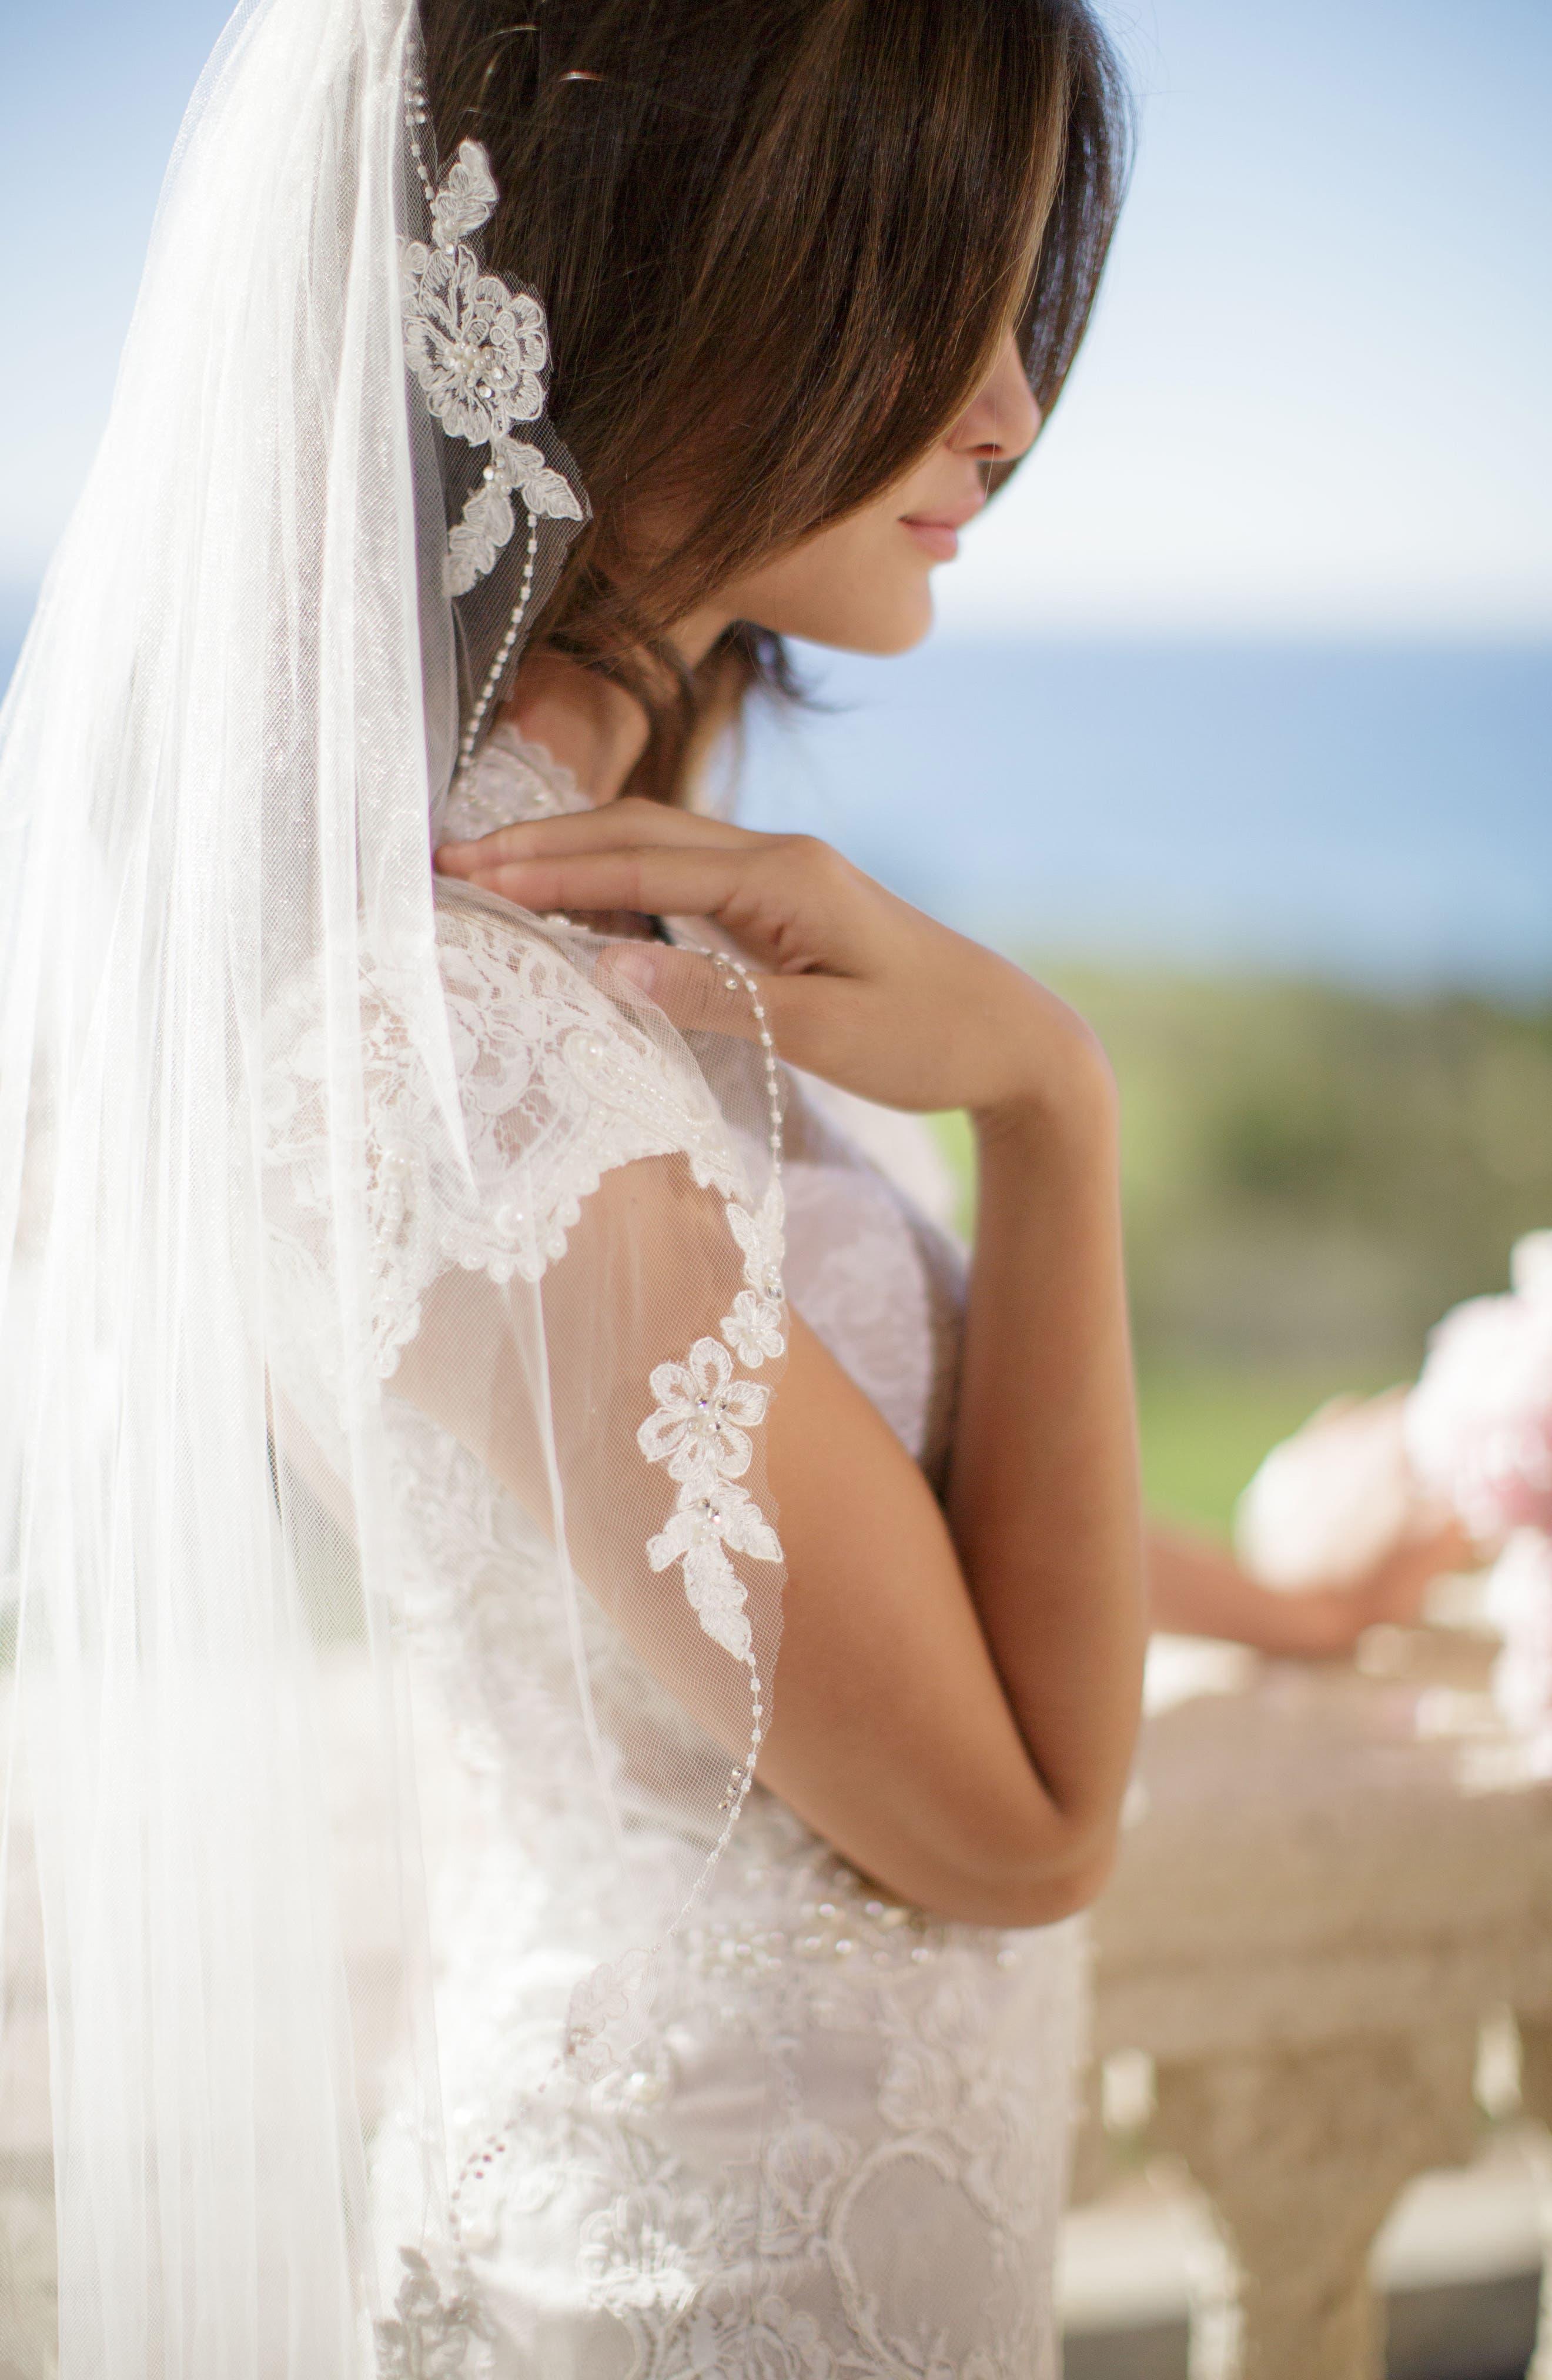 Alternate Image 2  - Brides & Hairpins Mikaela Embellished Veil